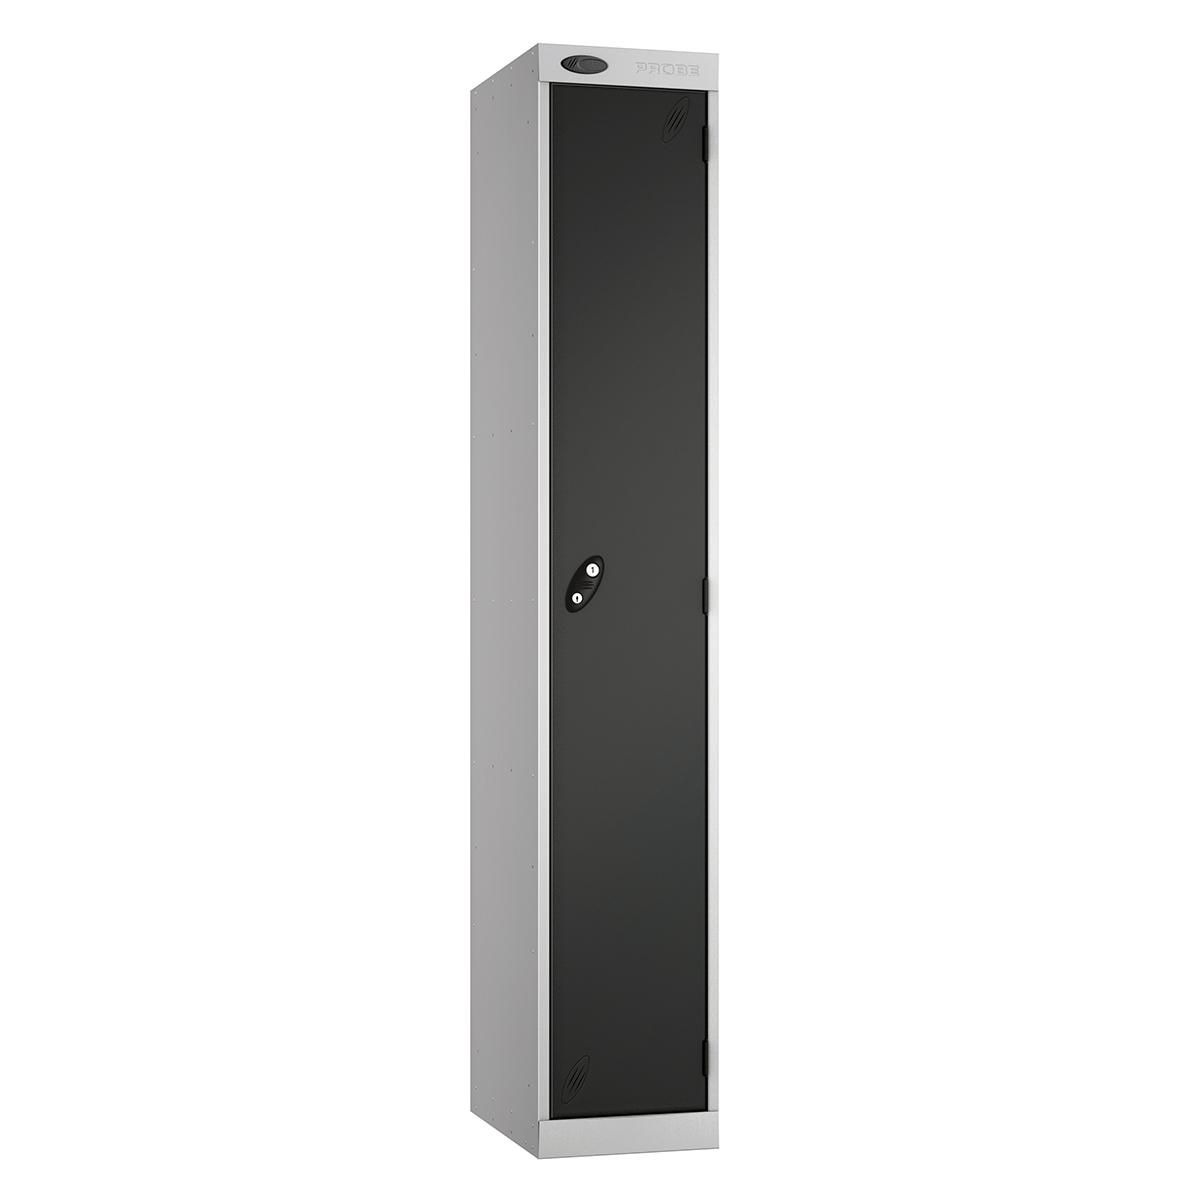 Probe Express Box Lockers - Nest 1 - 1 Tier Lockers